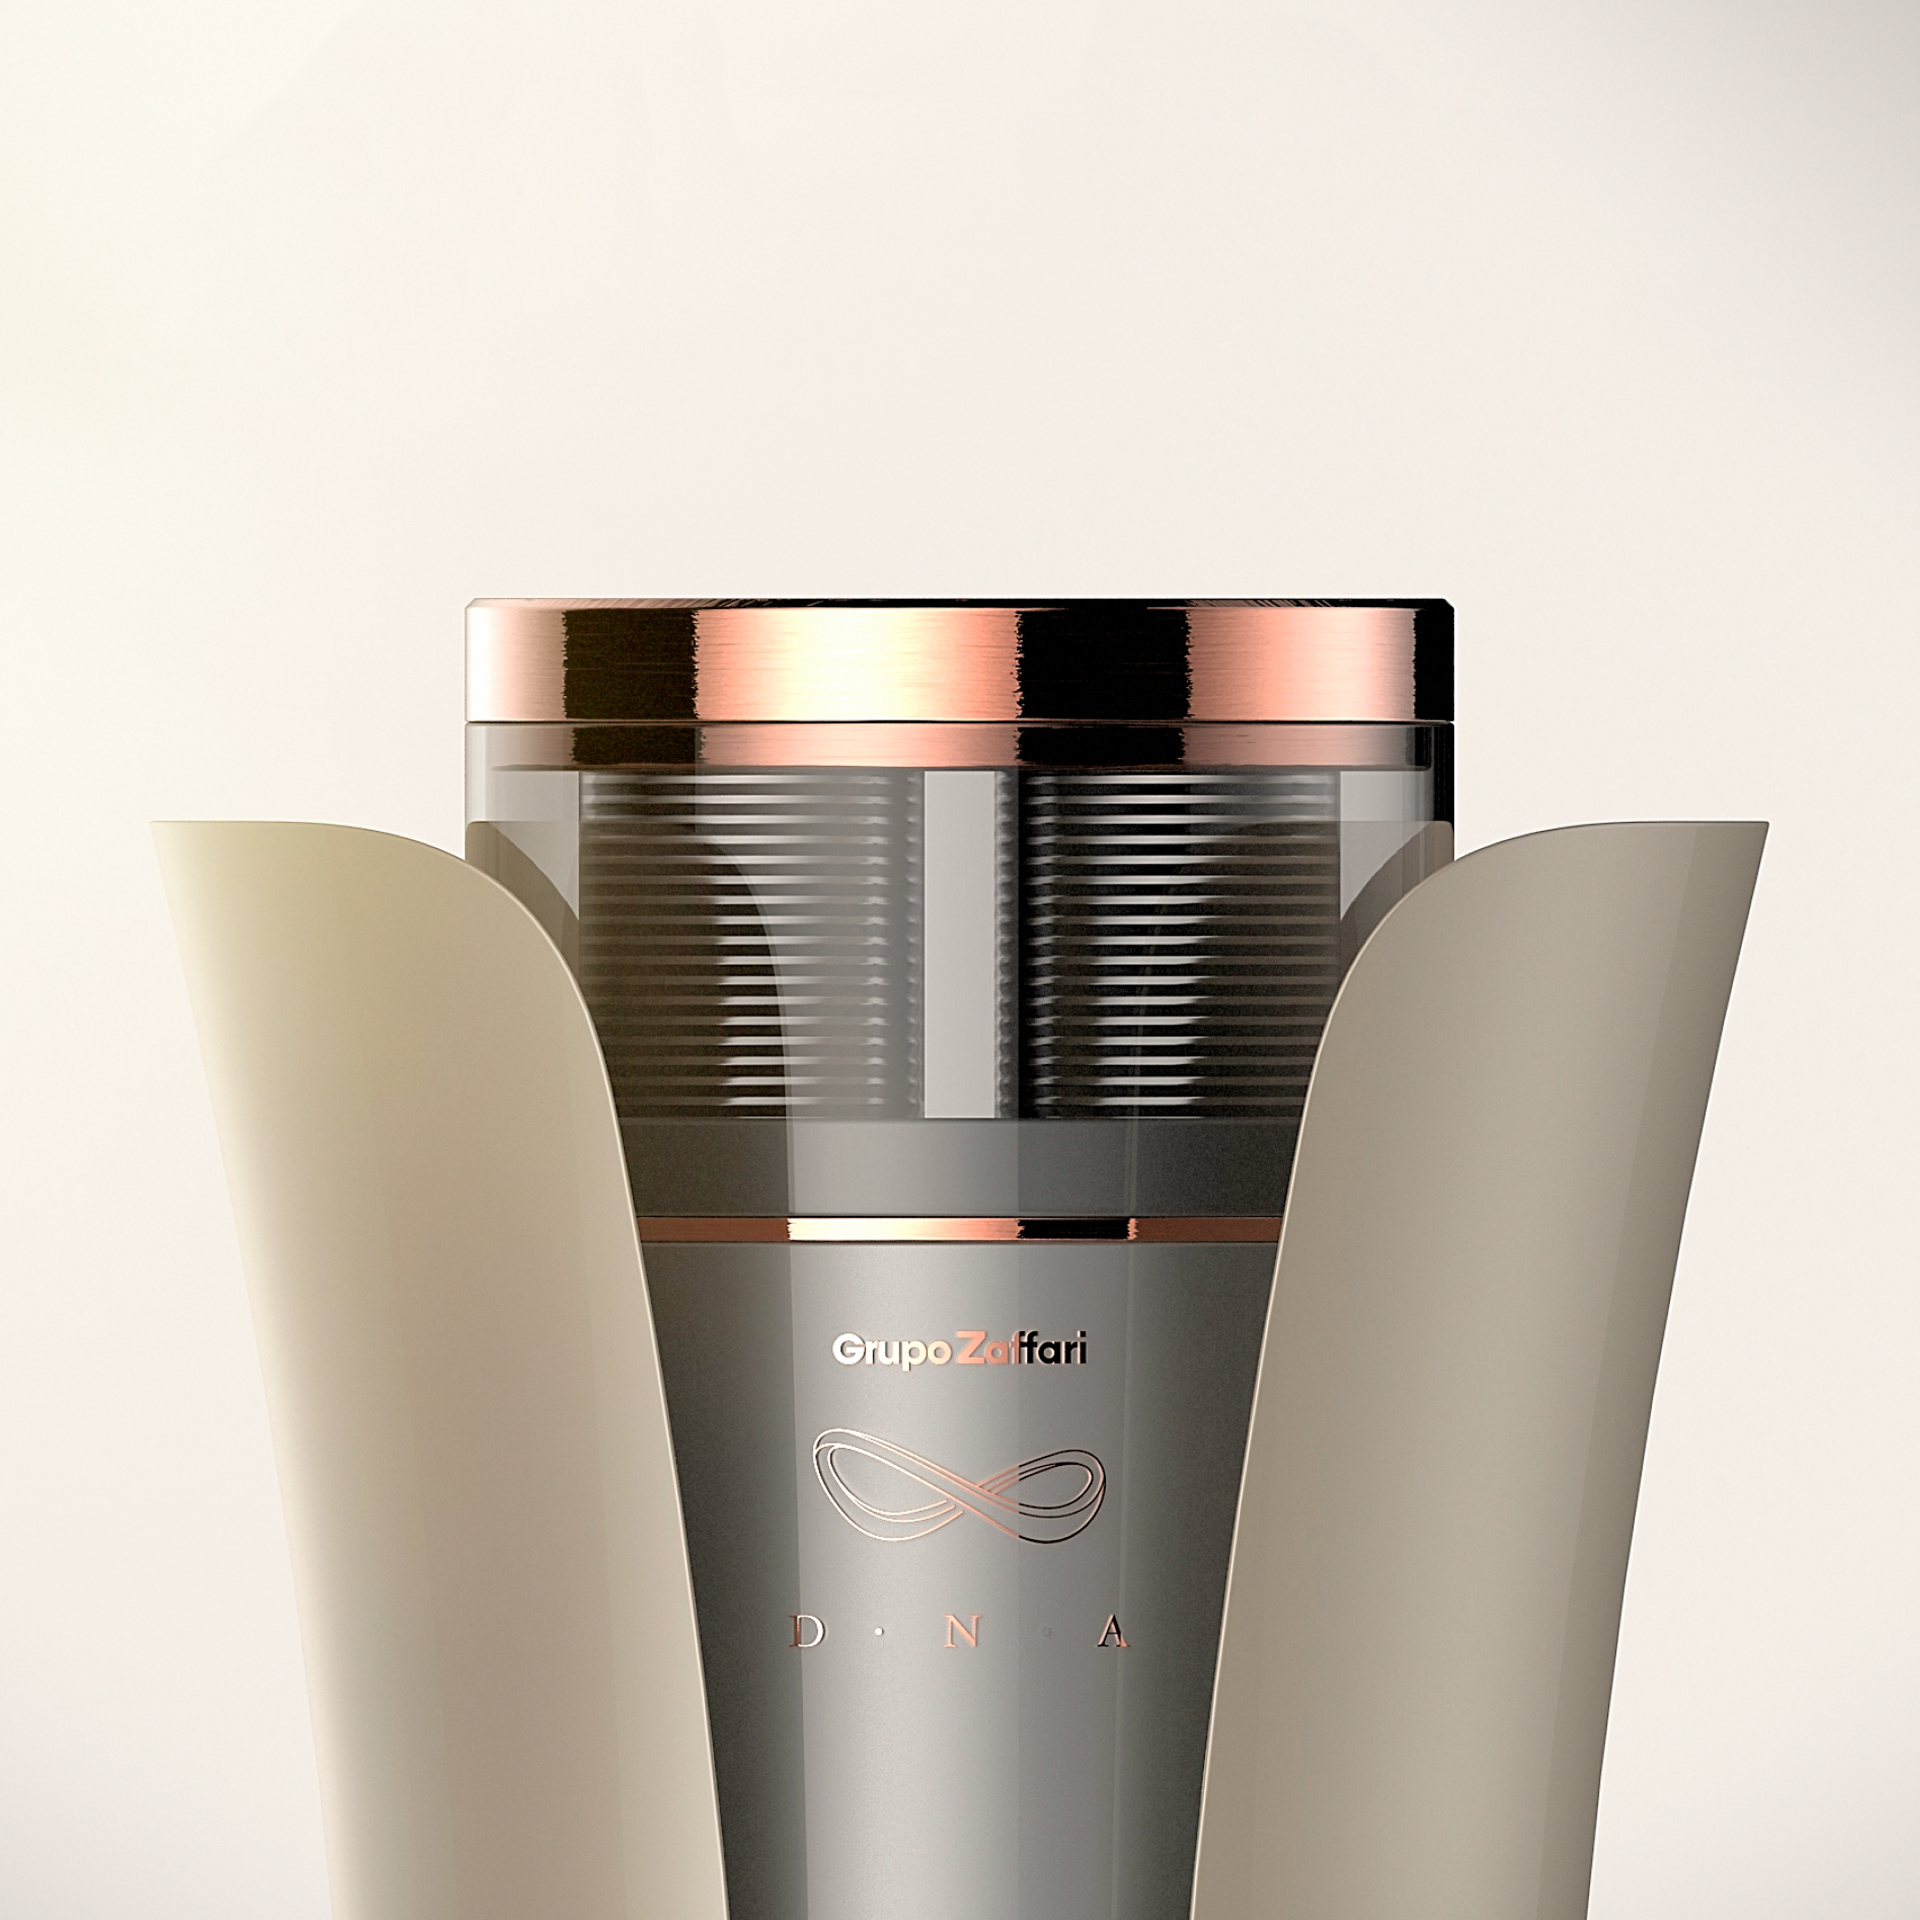 design-de-produto-zaffari-valkiria